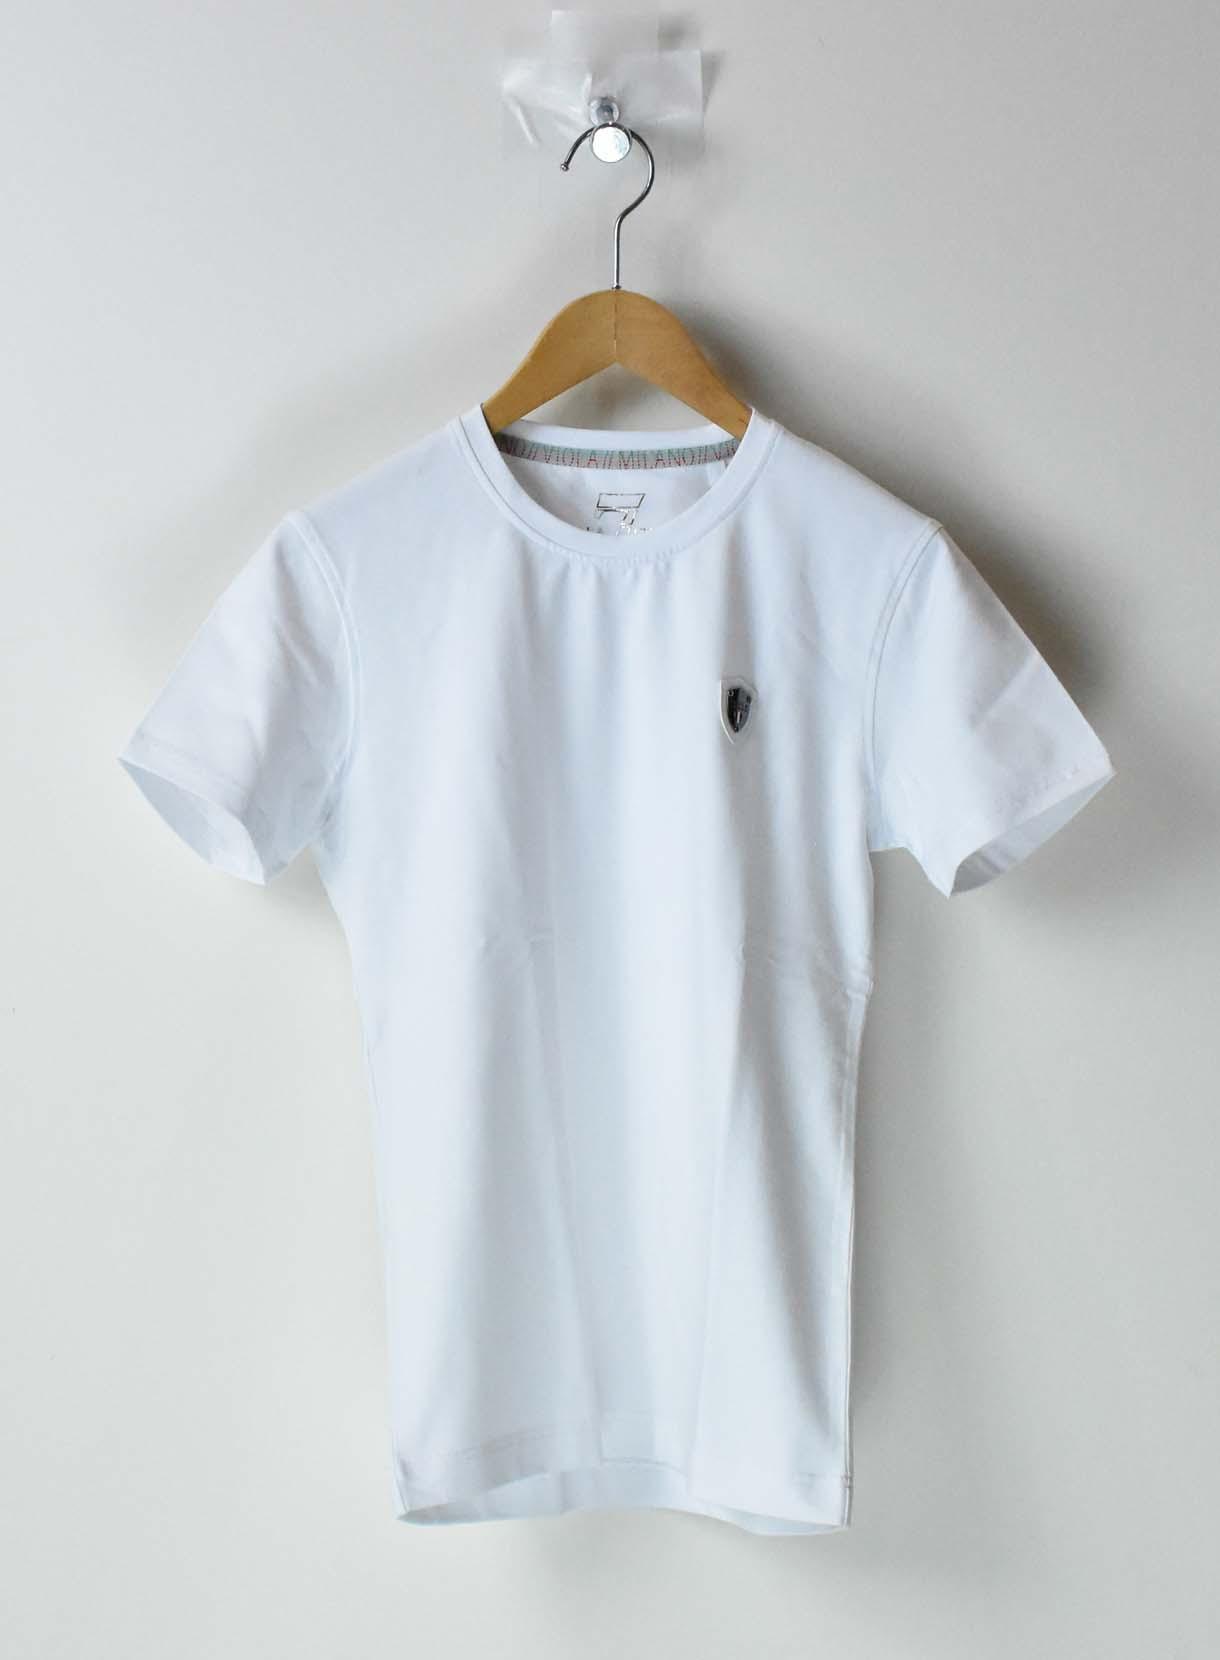 VIOLA無地Tシャツ(クルーネック)